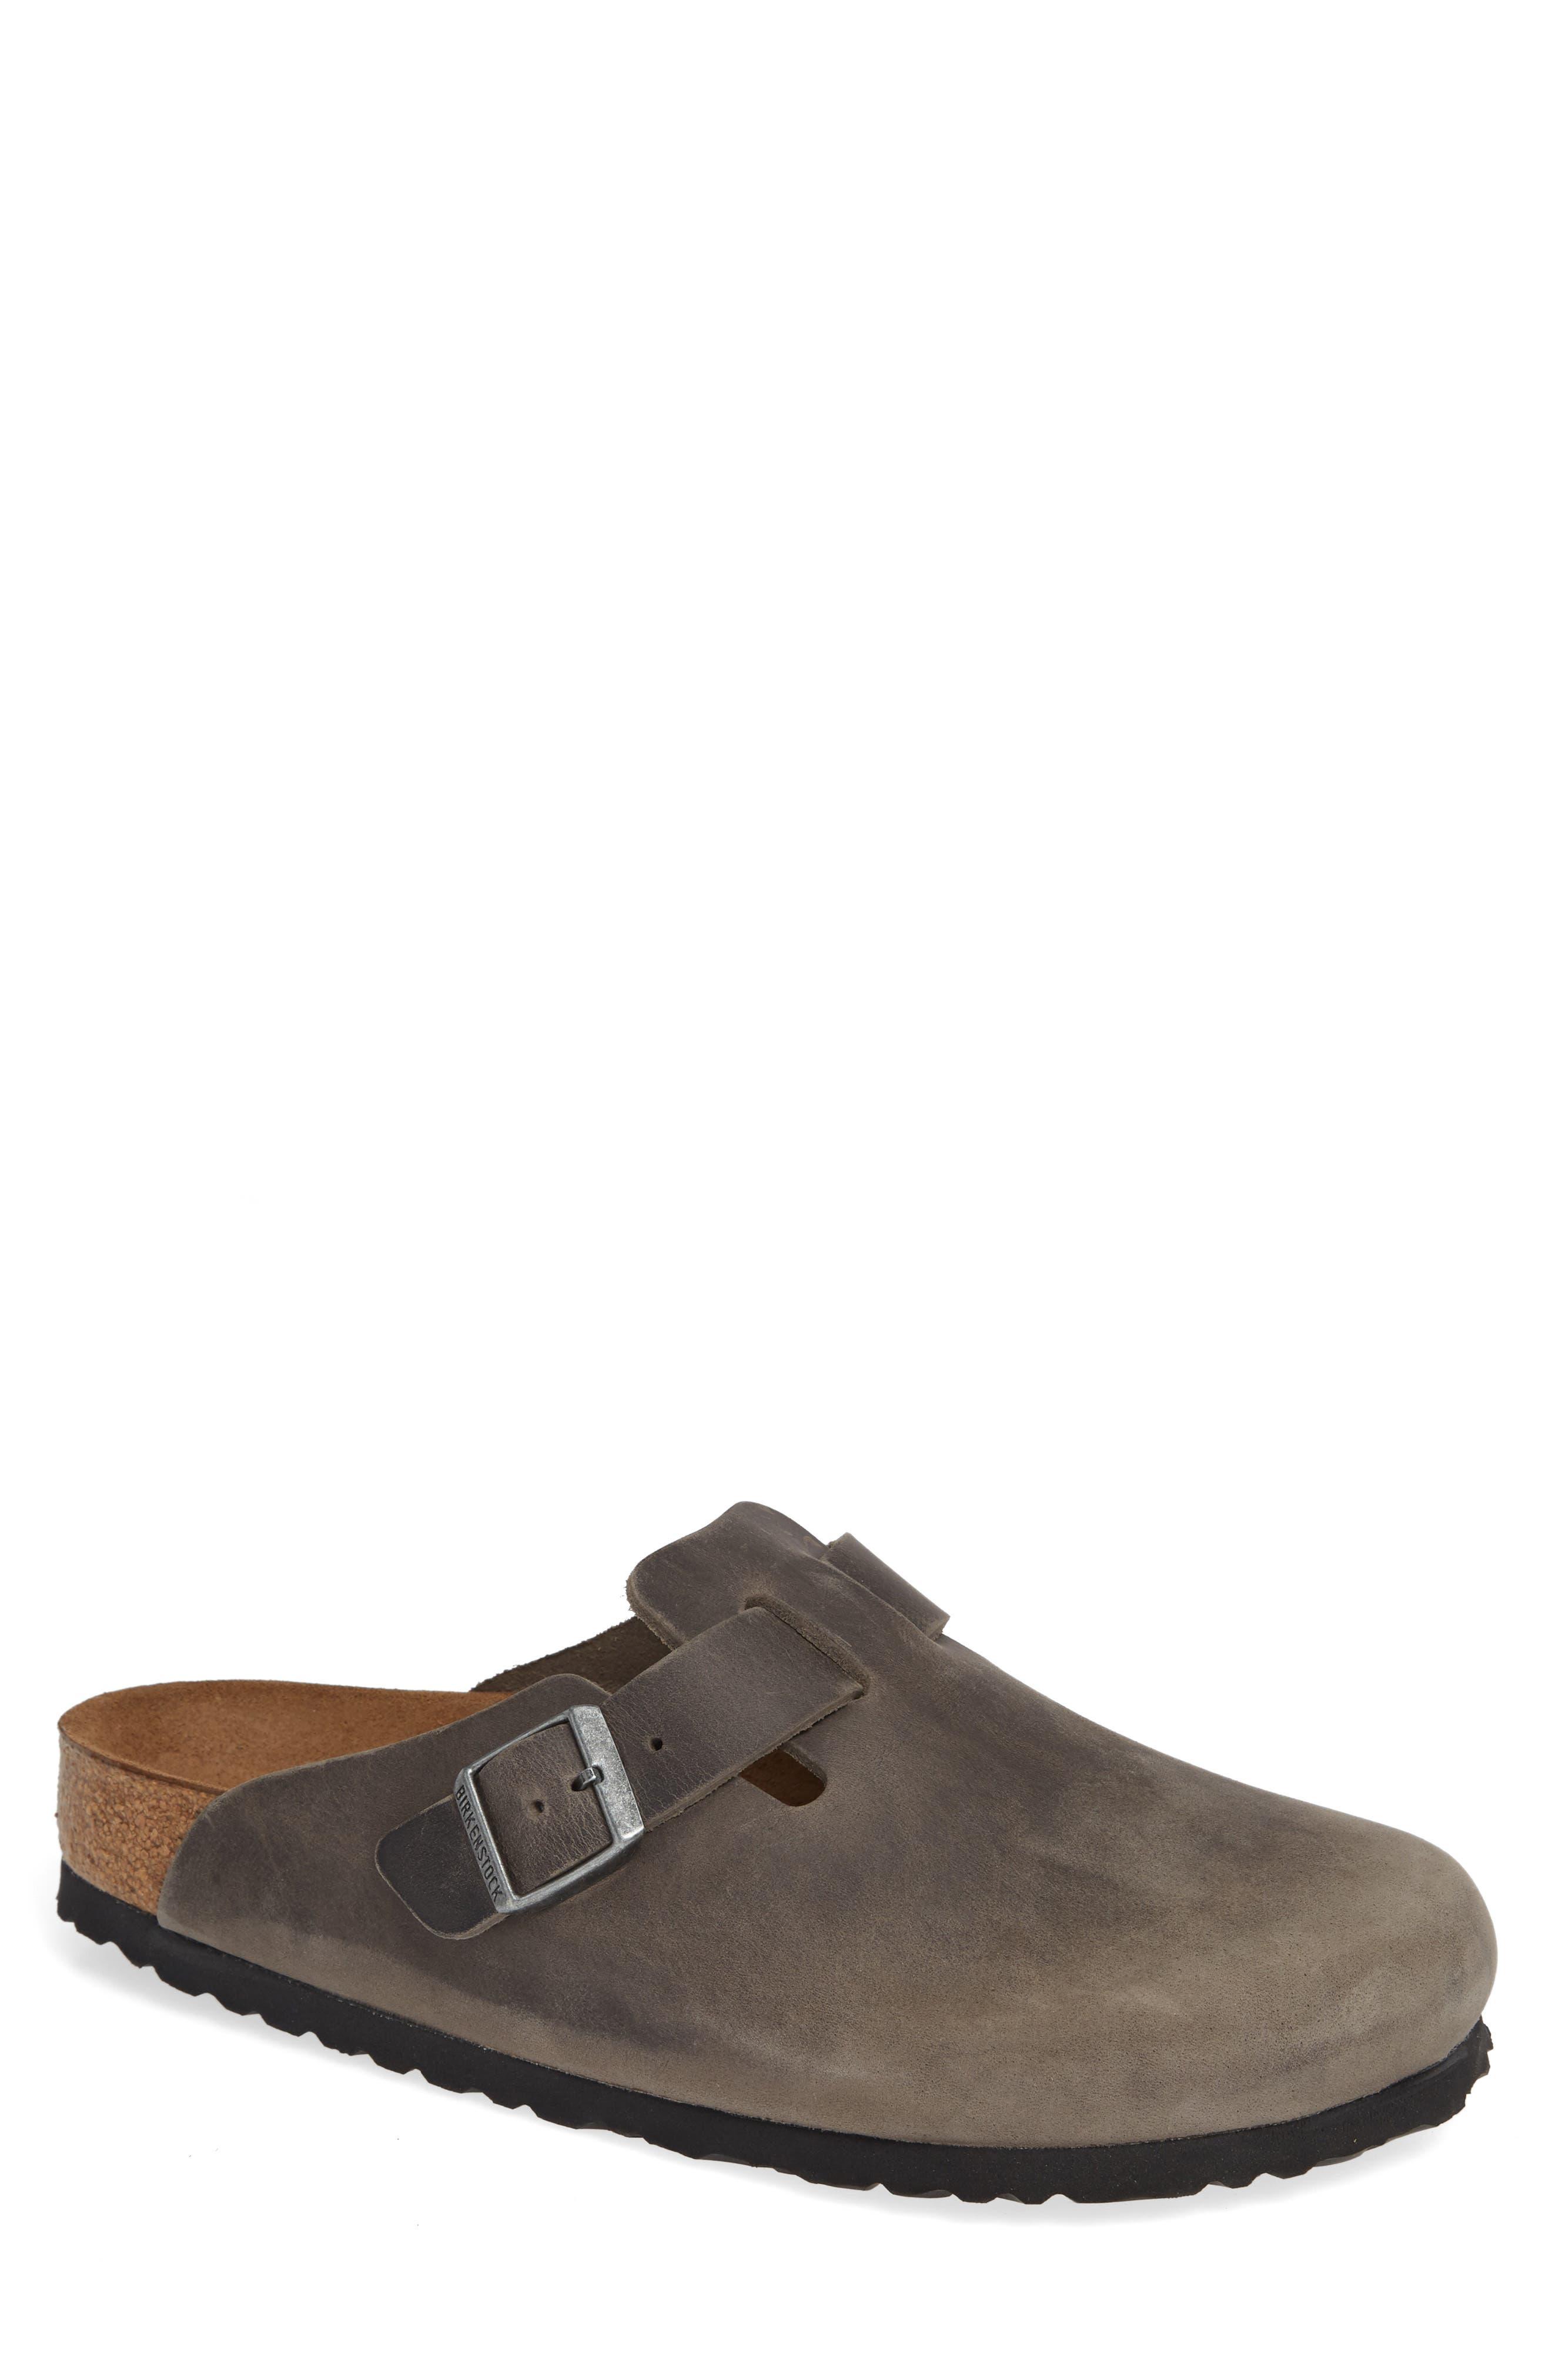 e977cd7d0f9 Grey Birkenstock Sandals